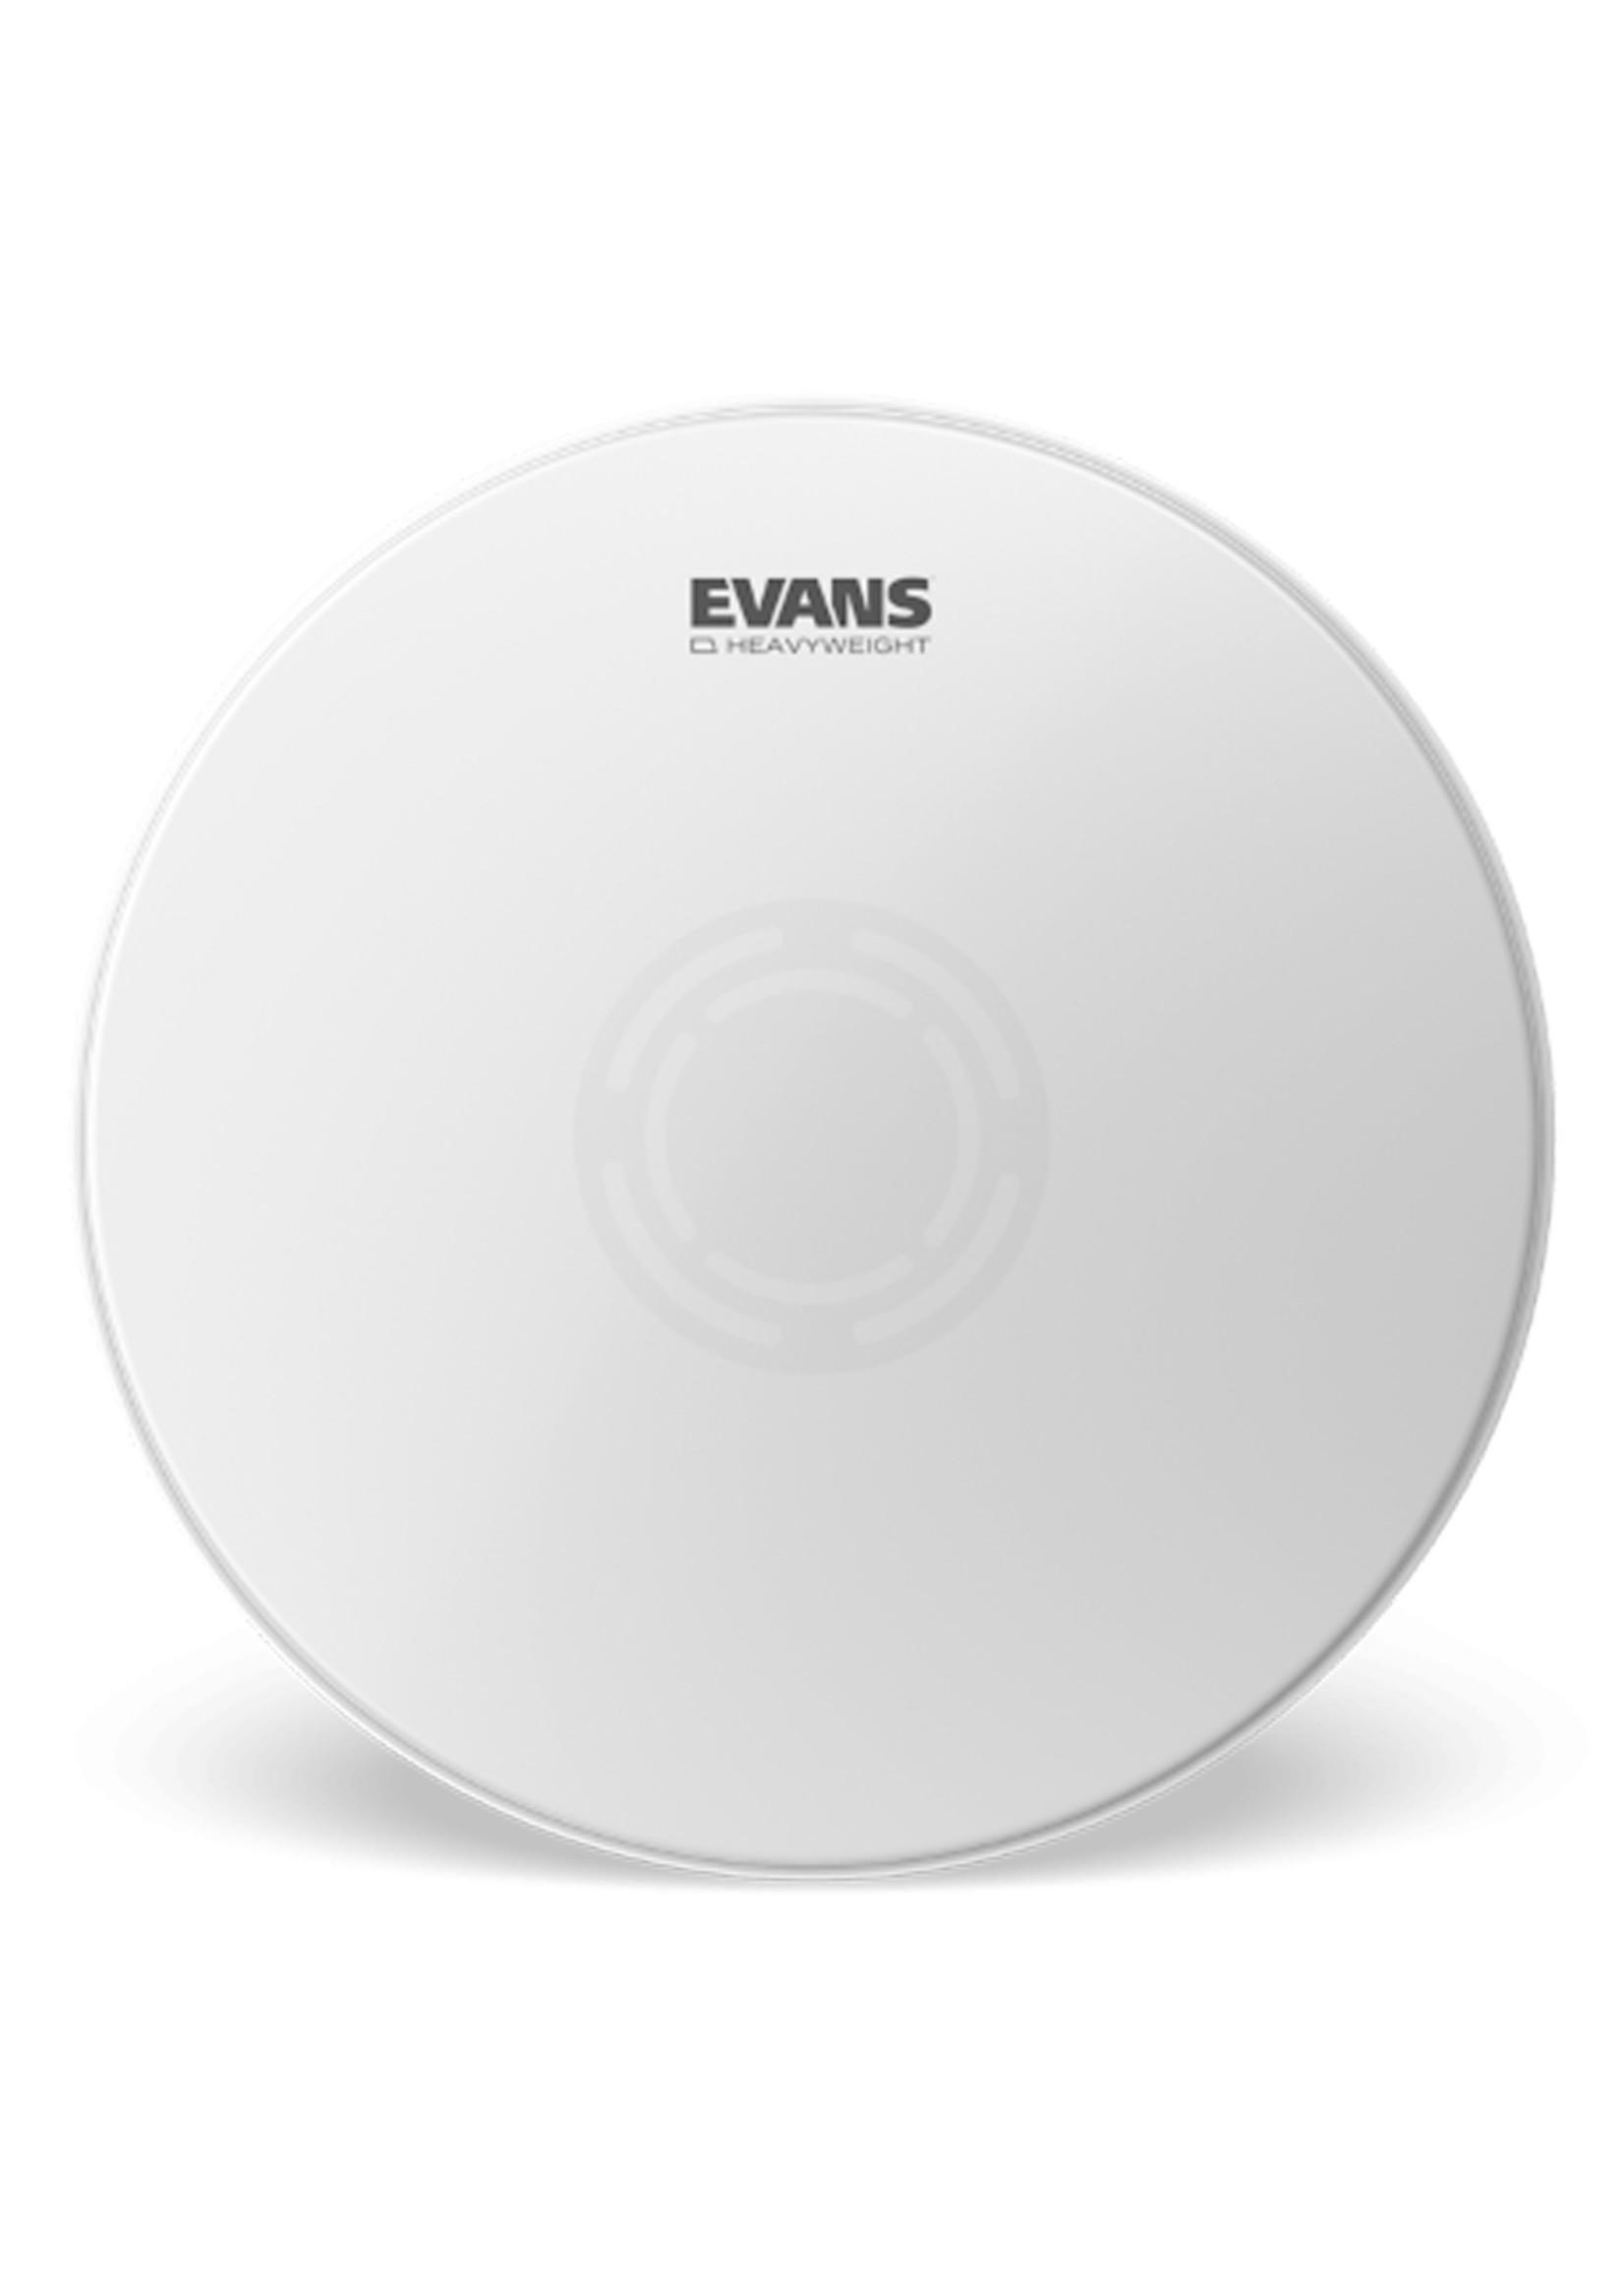 "Evans 14"" Heavyweight"